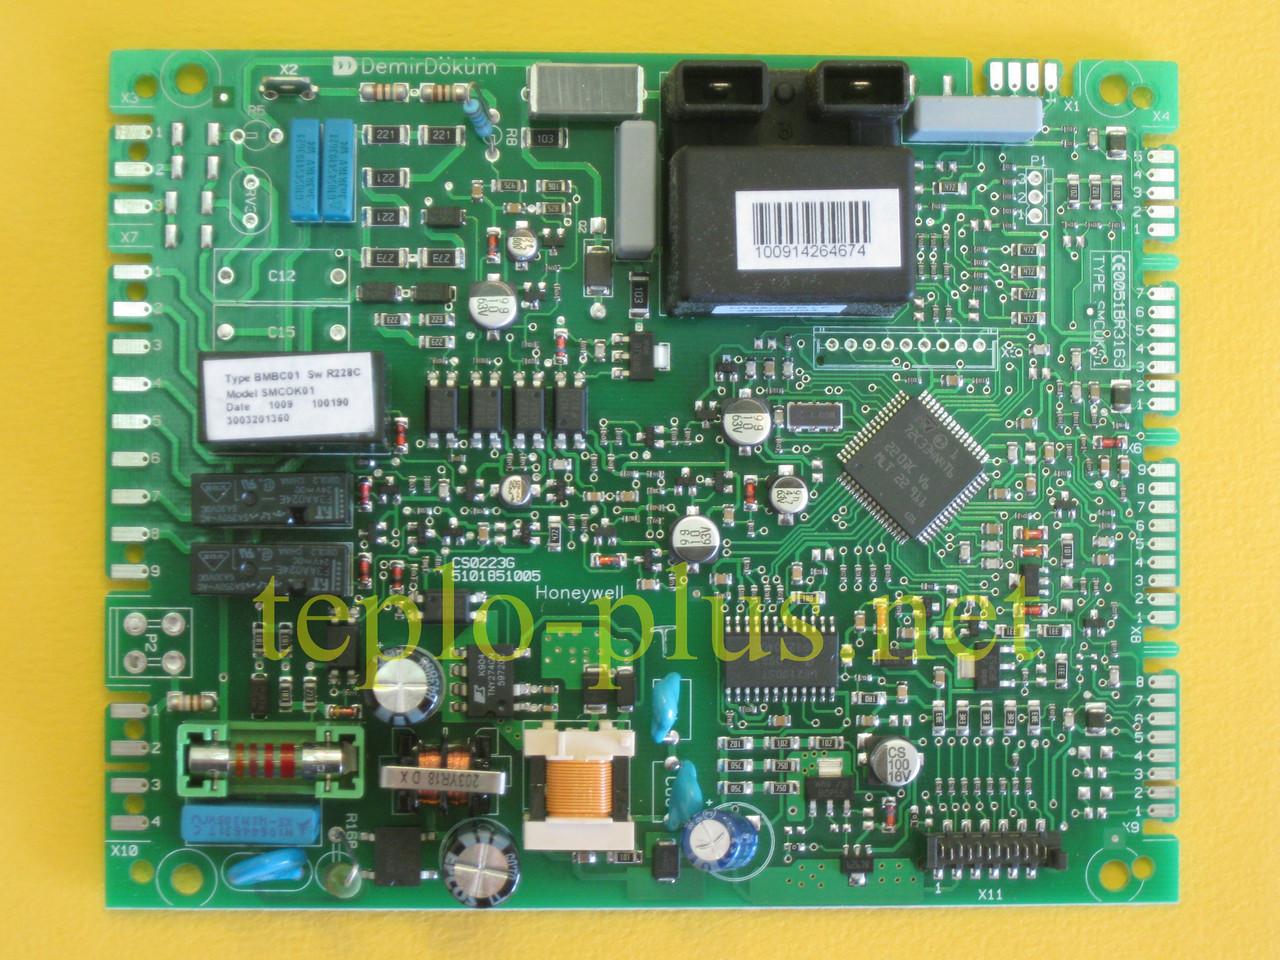 Плата управления 3003201360 (D003201360) Demrad Calisto HKD (BKD) 120/220, HKD (BKD) 124/224, HKD(BKD) 130/230